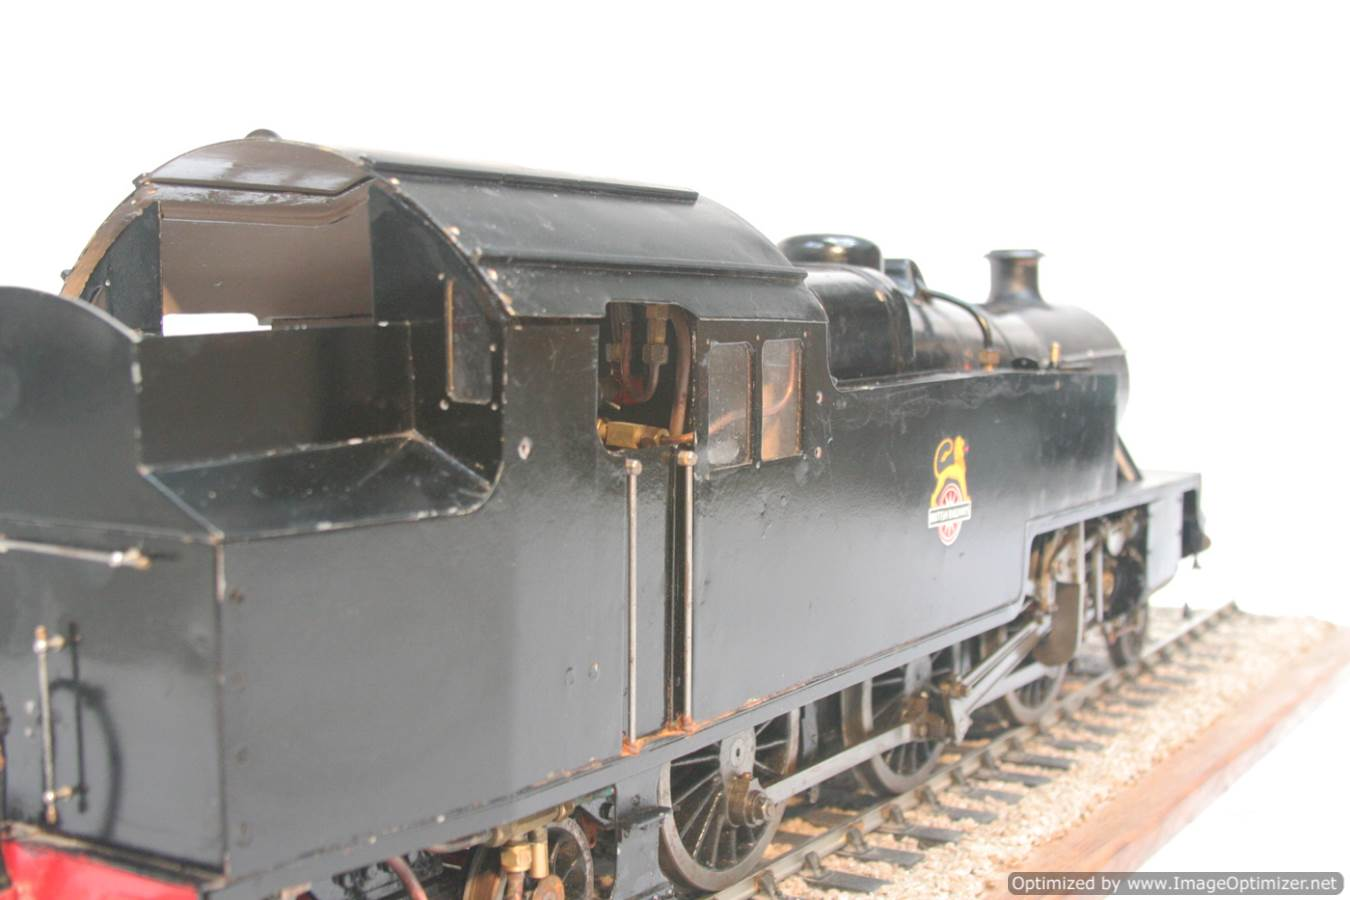 test 3 & a half inch gauge LMS Stanier class 4 tank Martin Evans Jubilee steam model for sale 08-Optimized